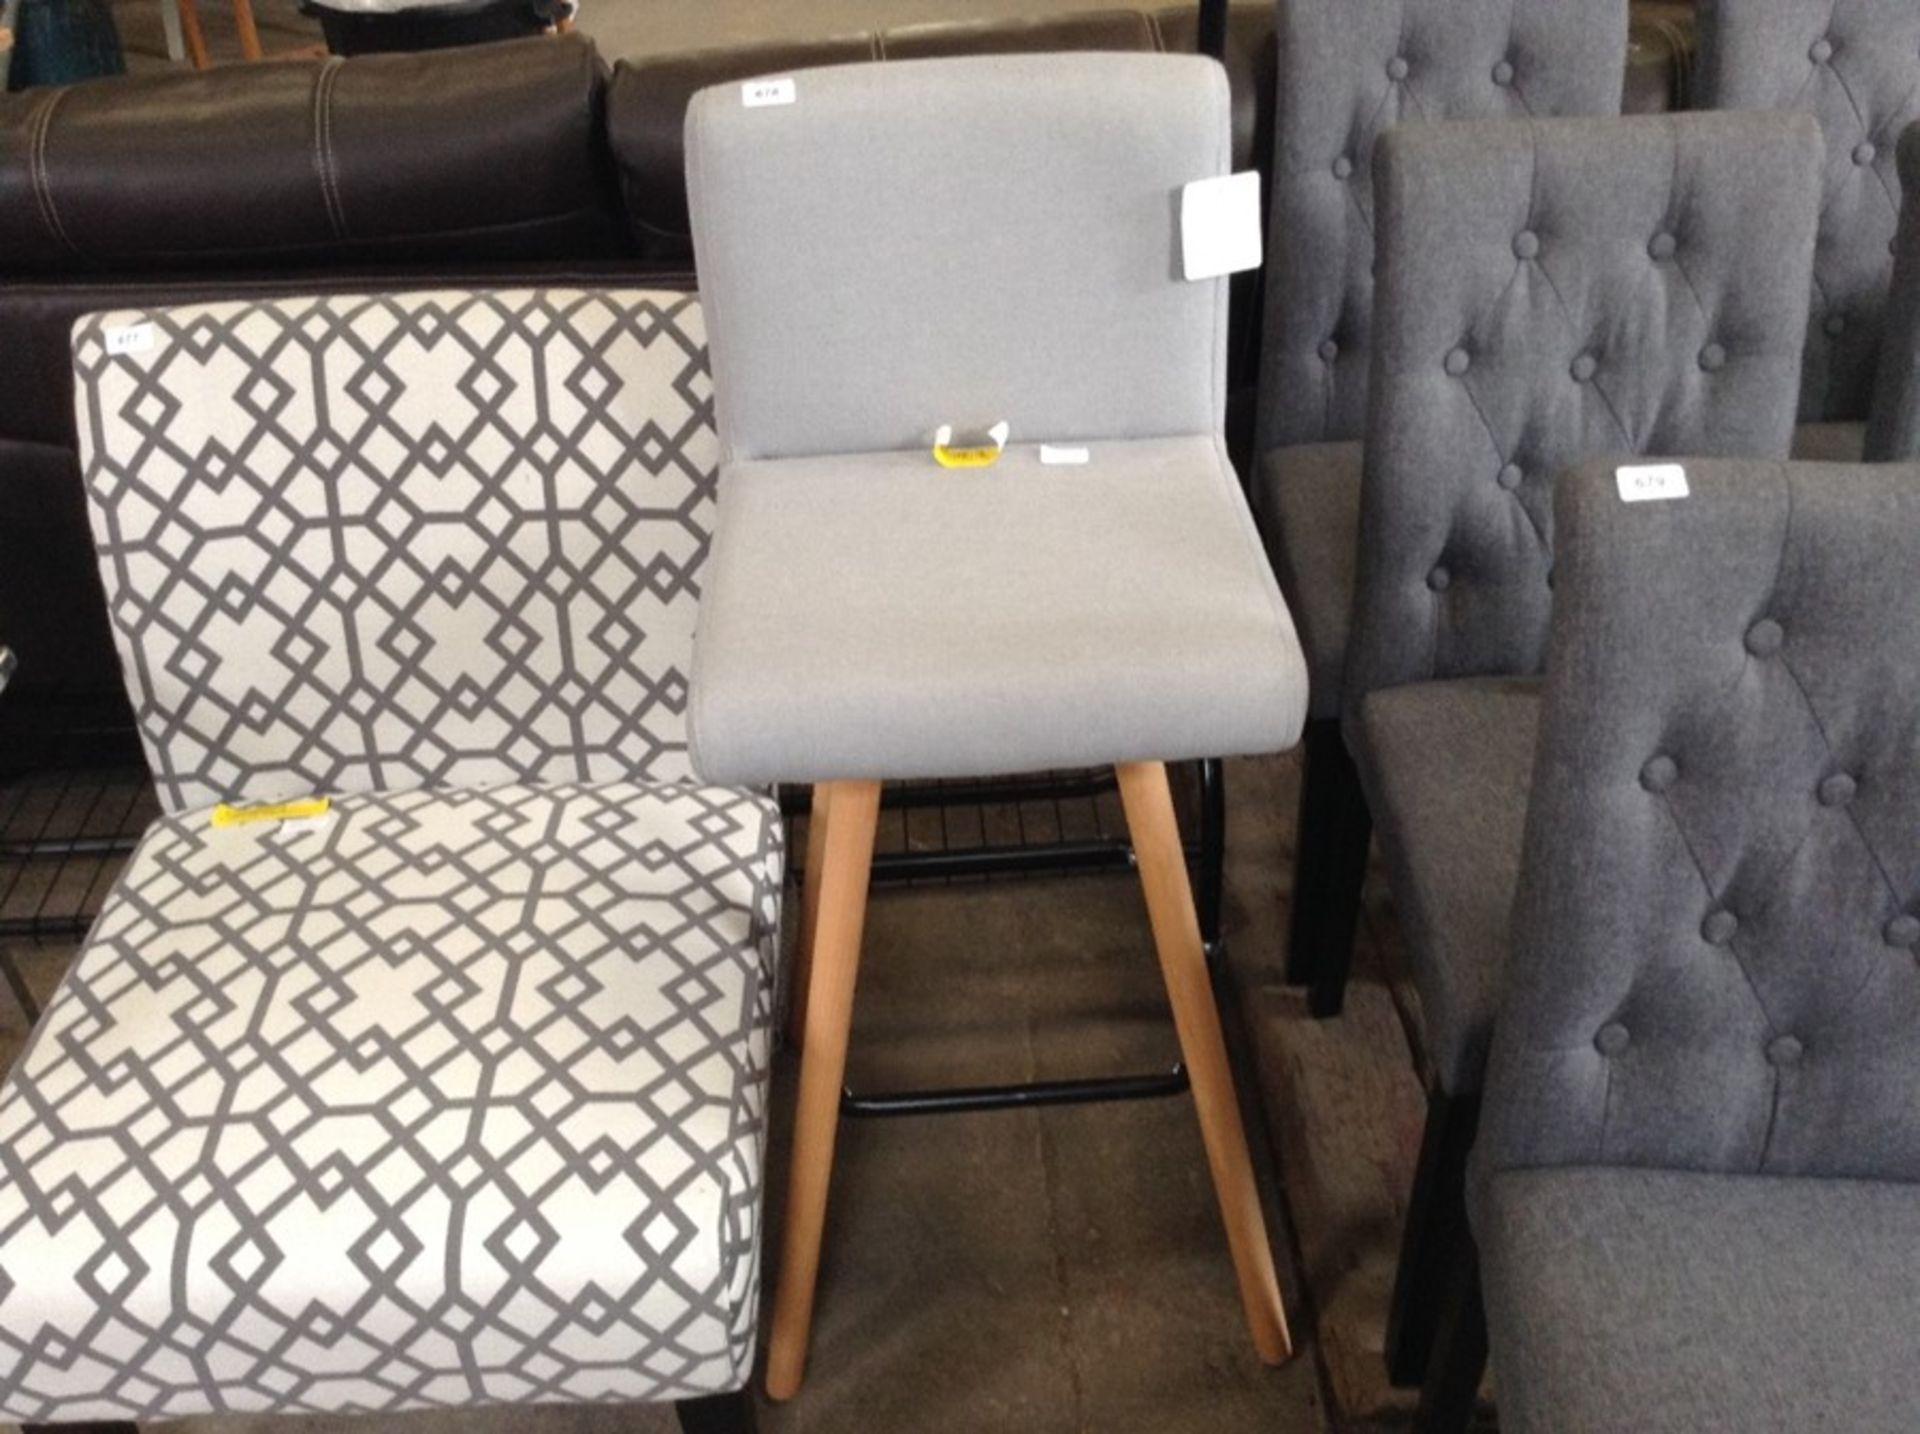 Lot 678 - Ebern Designs,Moritz Wooden Bar Stool Light Grey Fabric RRP - £78.99 (H16053 - 3/23 -LKLD1047.